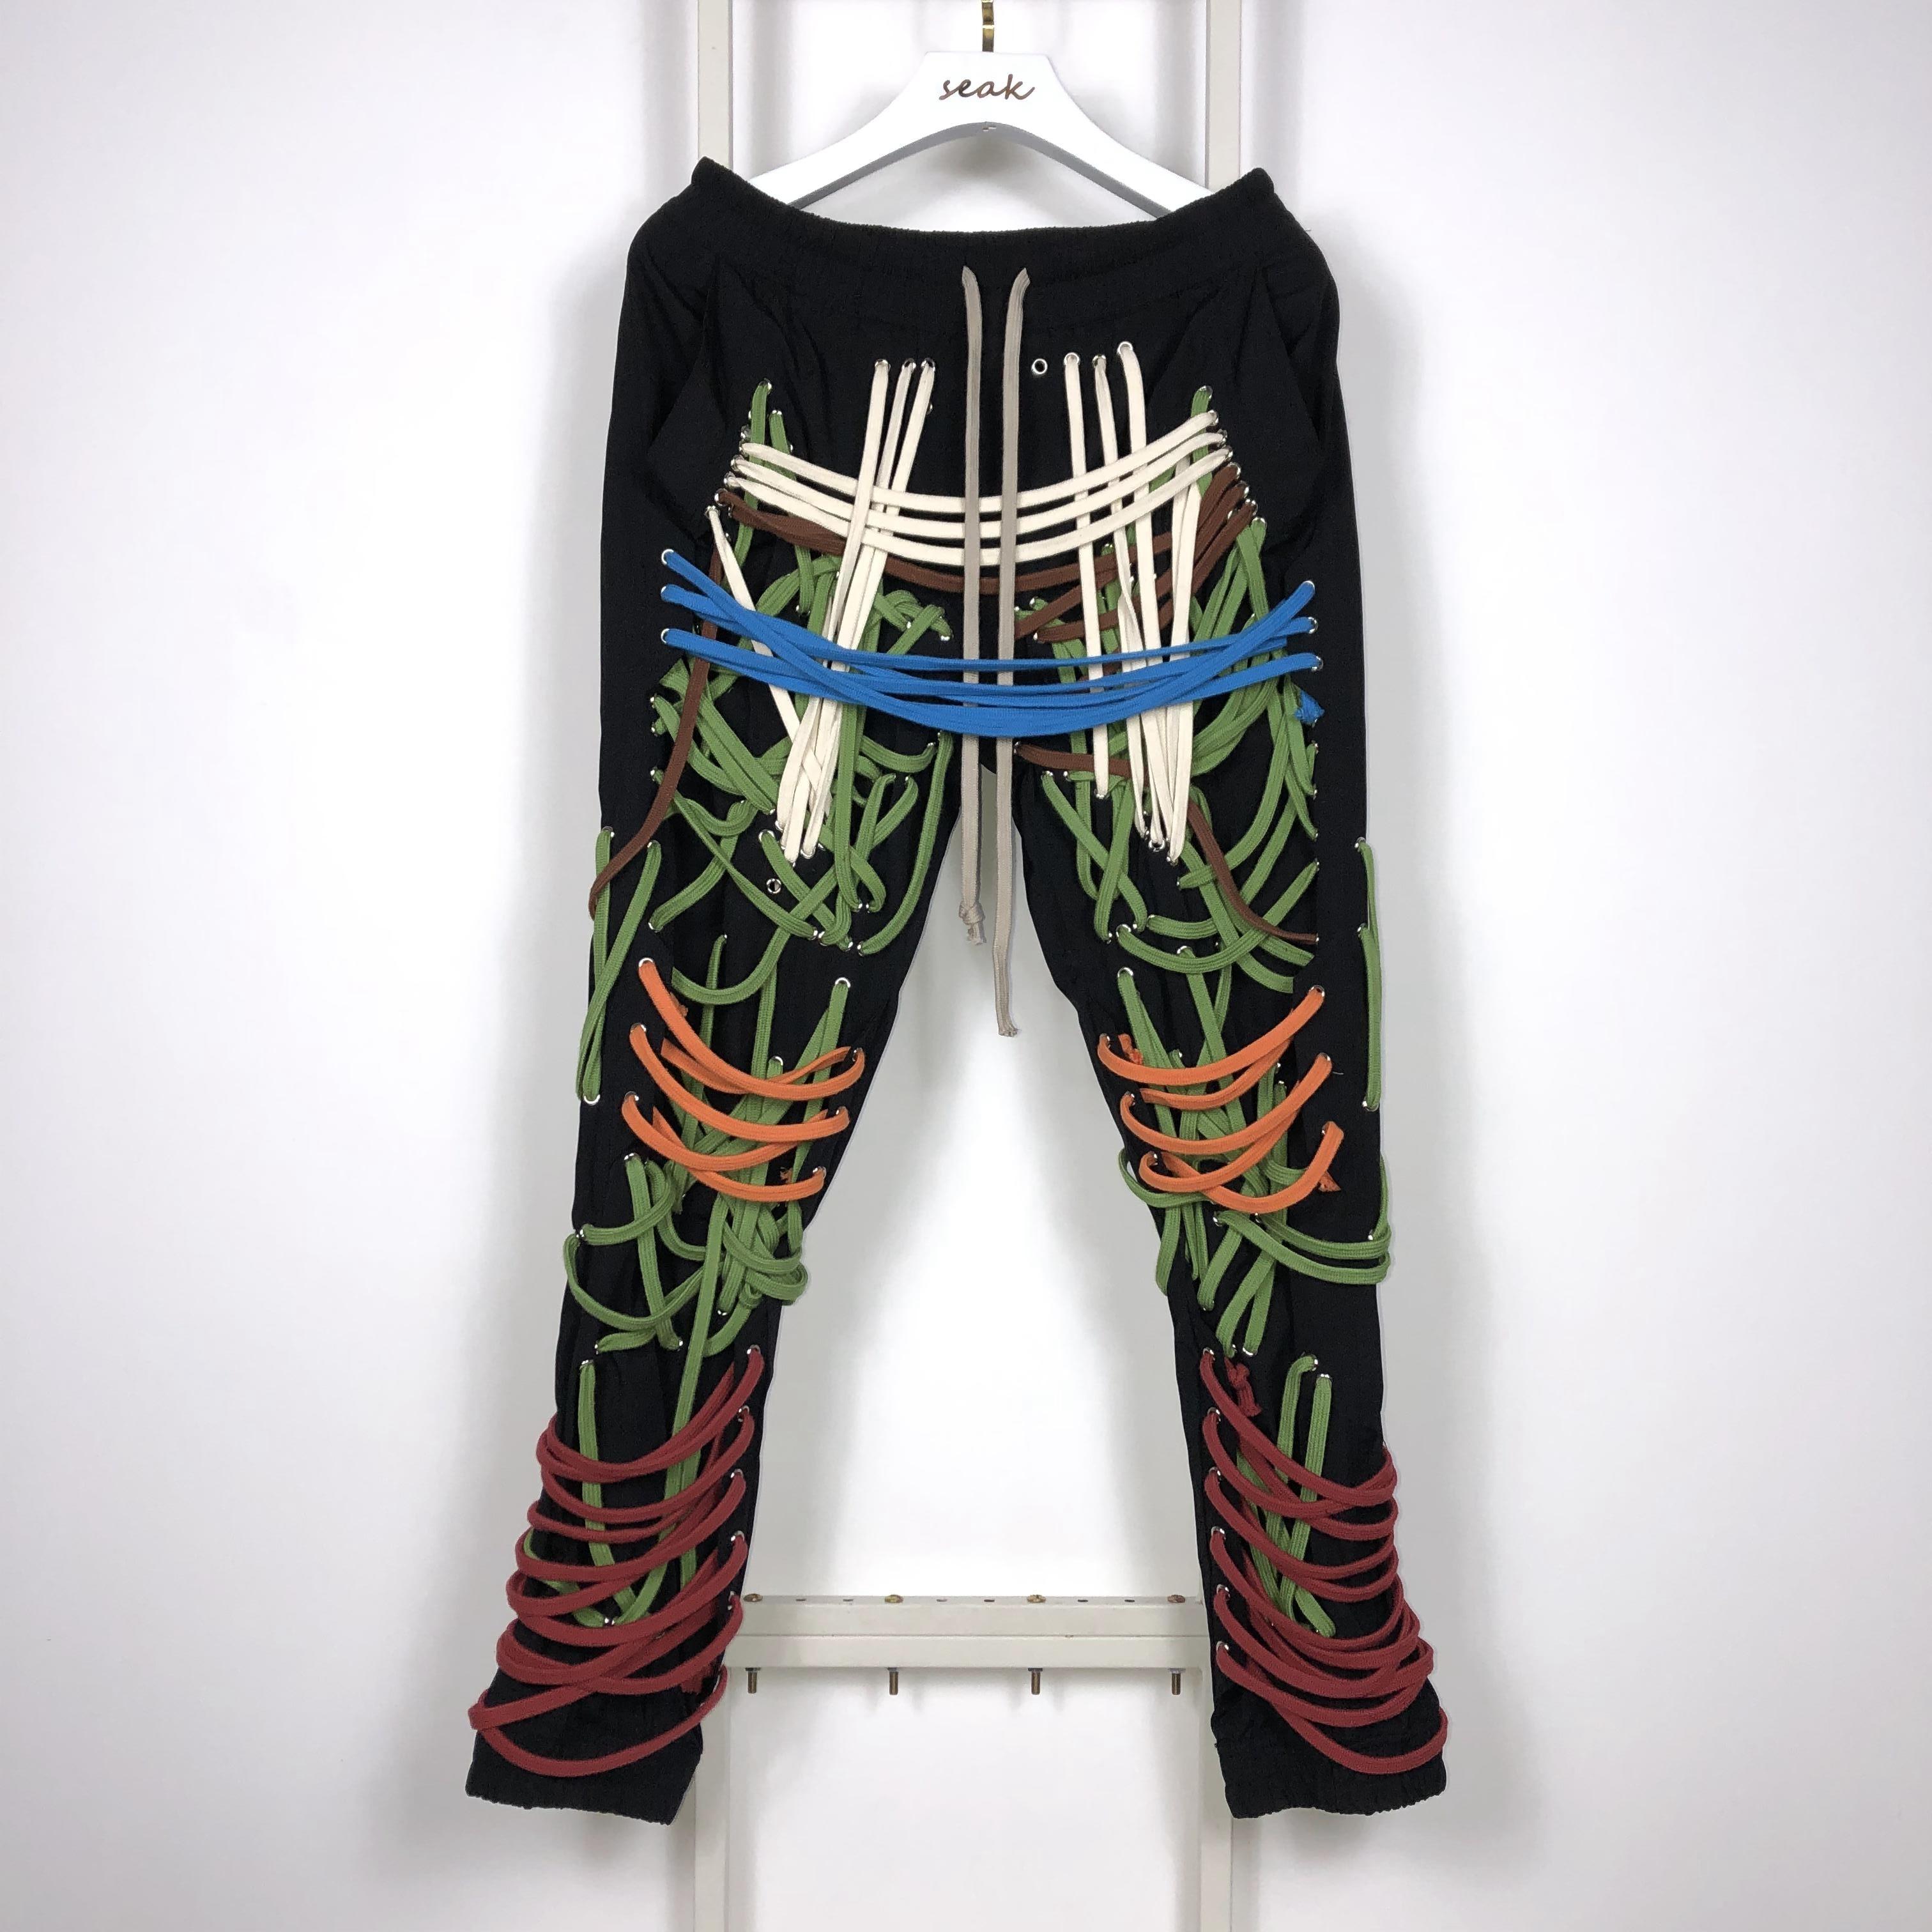 20SS Owen Seak Men Casual Pants Gothic Men's Harem Sweatpants Cargo Summer Cross Lightweight Women Solid Loose Black Pants